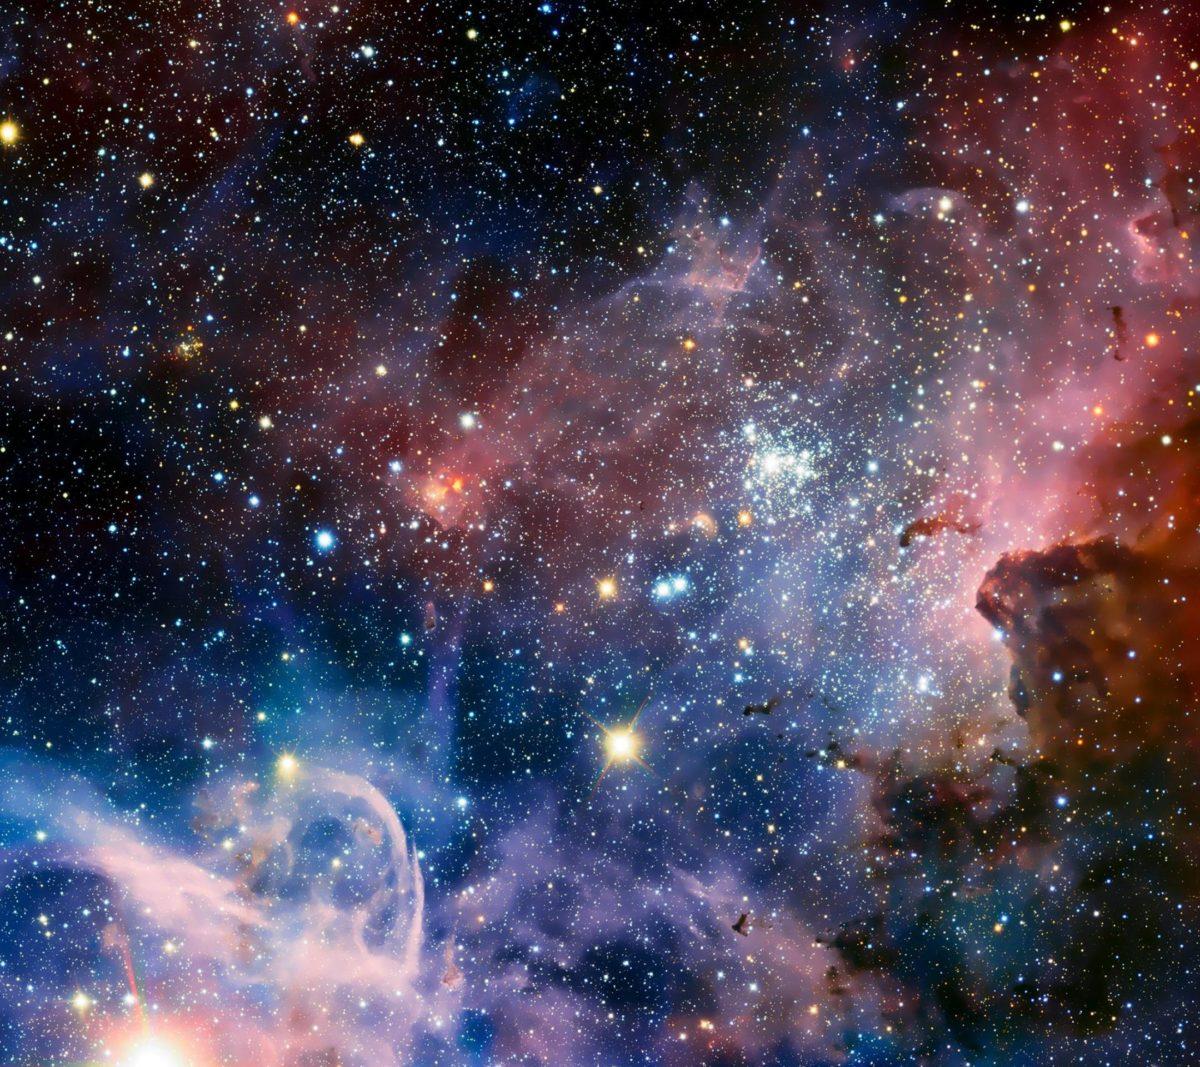 Galaxy Wallpaper 33 399244 High Definition Wallpapers| wallalay.com